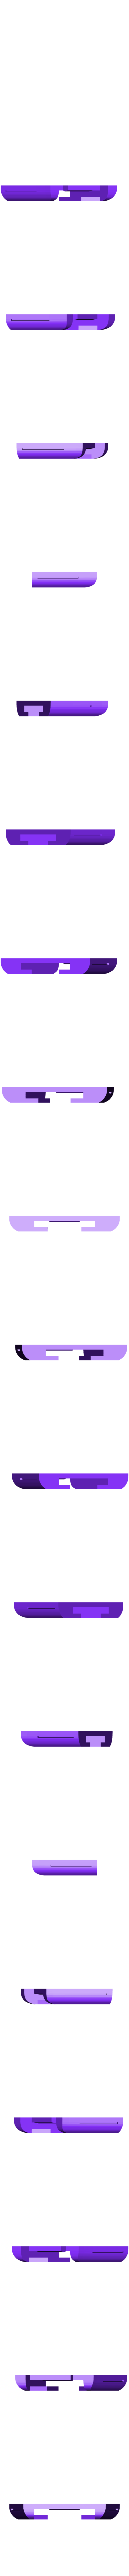 fix_female.STL Download free STL file Bold Machines: Margo's Dog named Eddie • 3D printer model, boldmachines